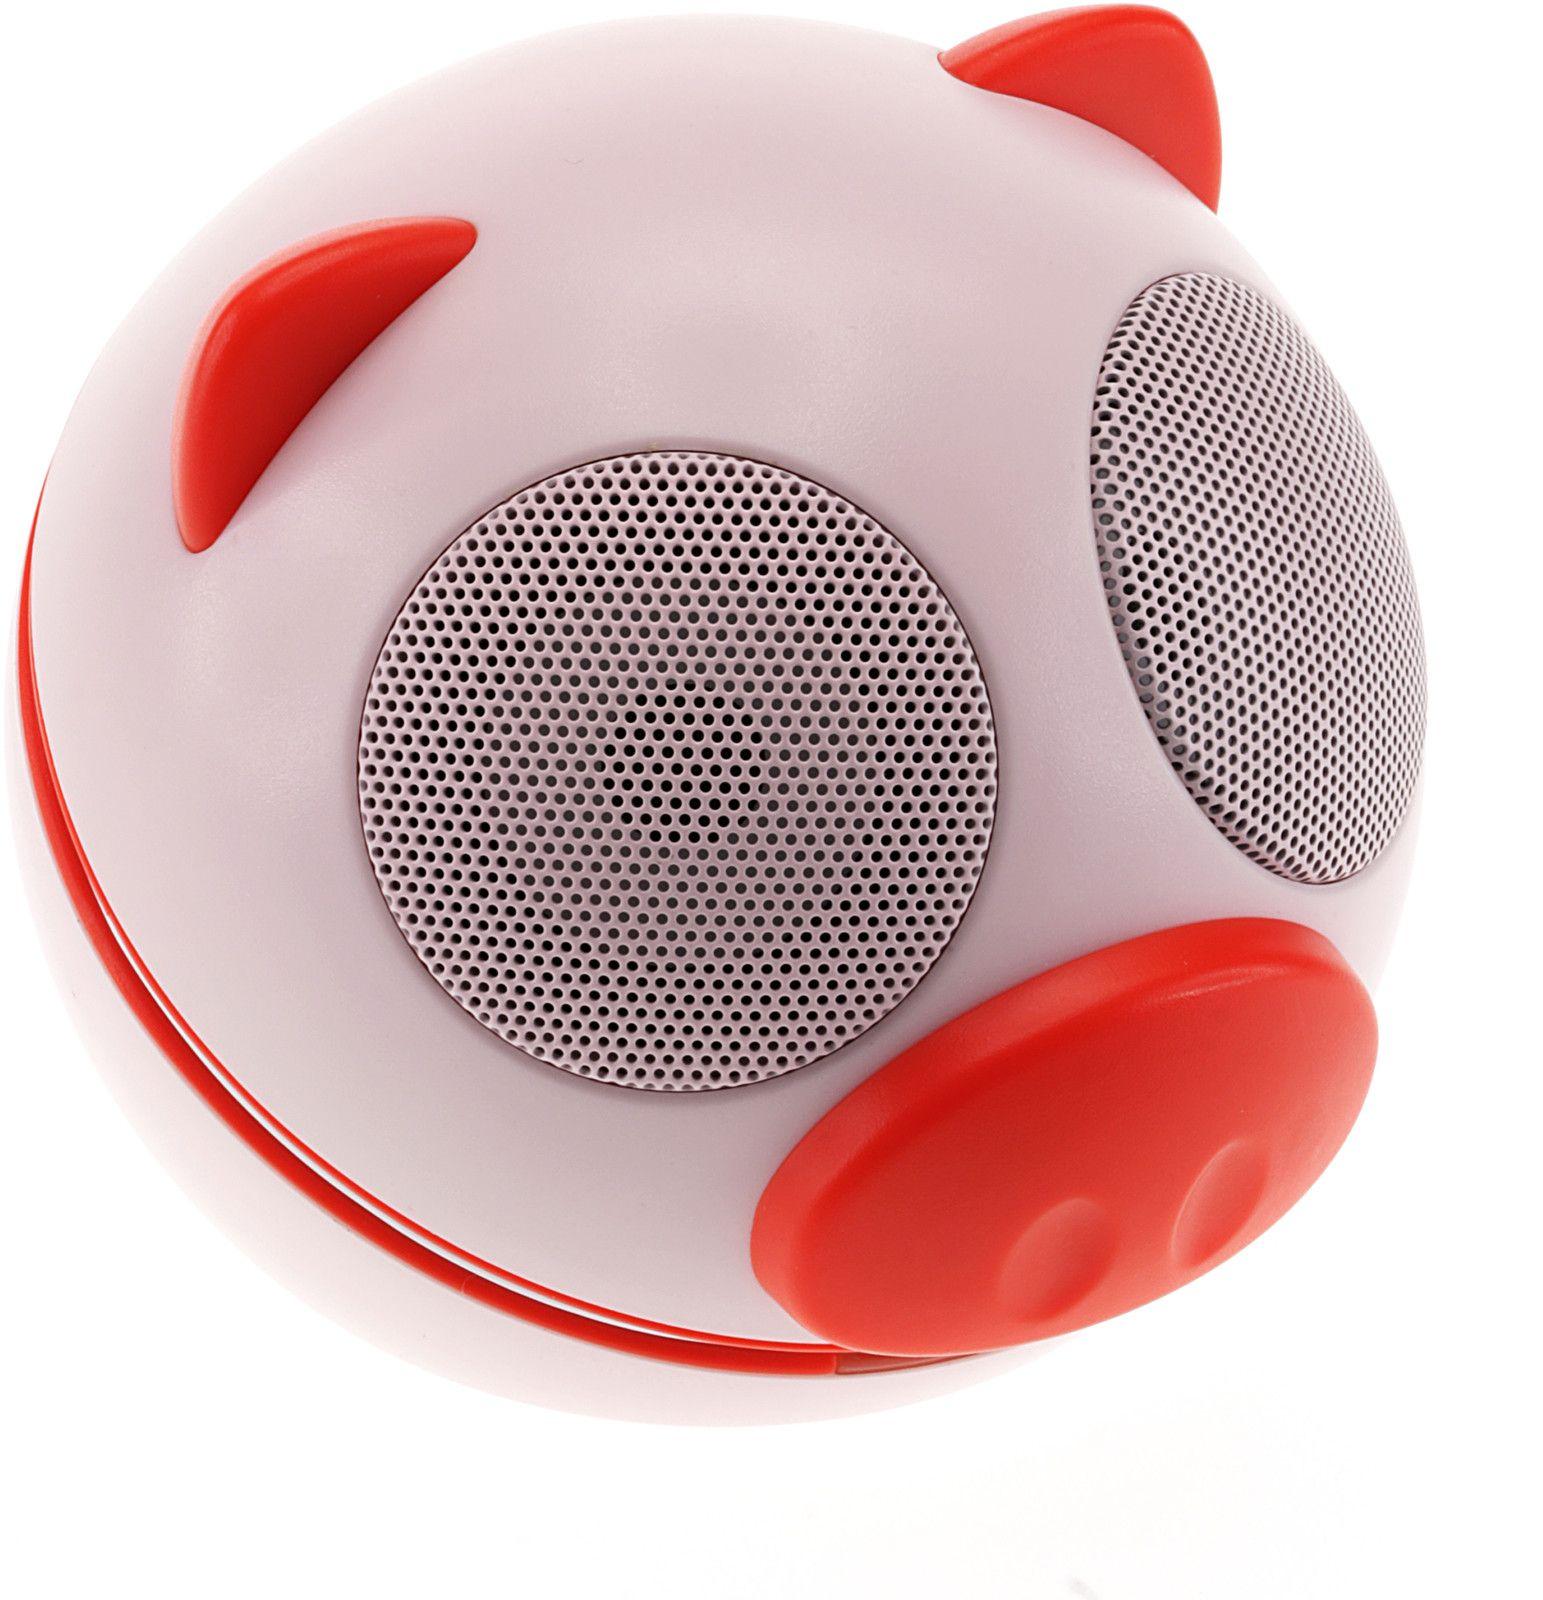 Kitsound Piggy XL - Portabel högtalare